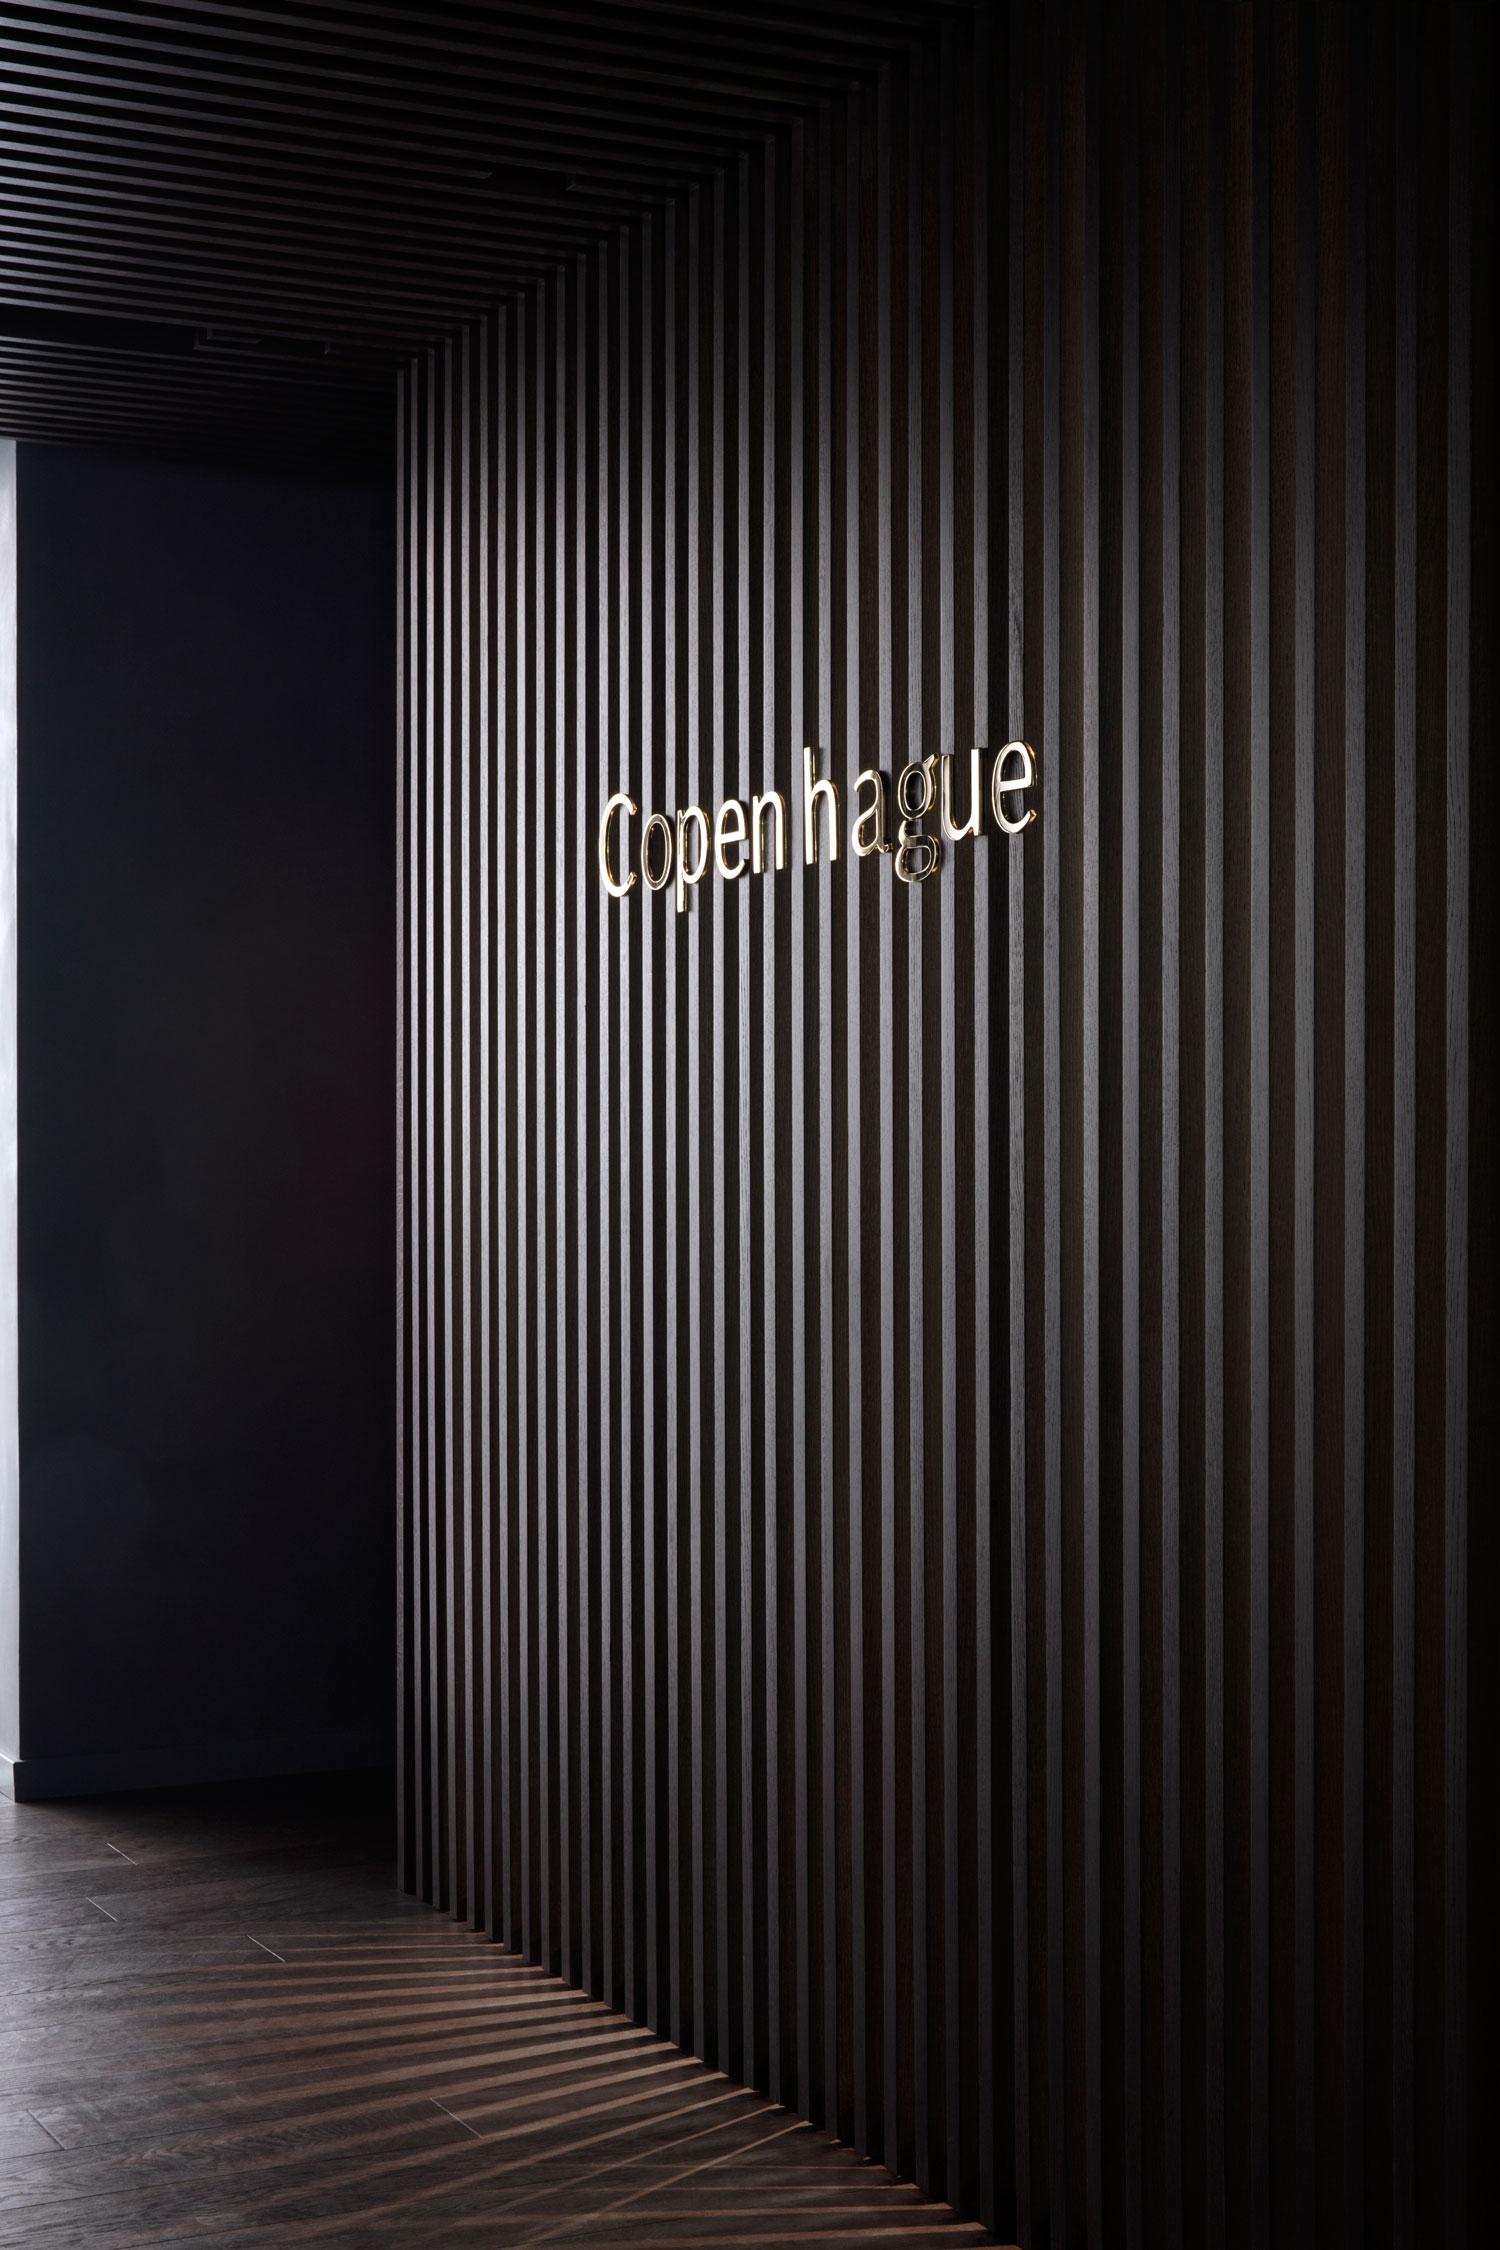 Copenhague Restaurant at Maison du Danemark in Paris by GamFratesi | Yellowtrace